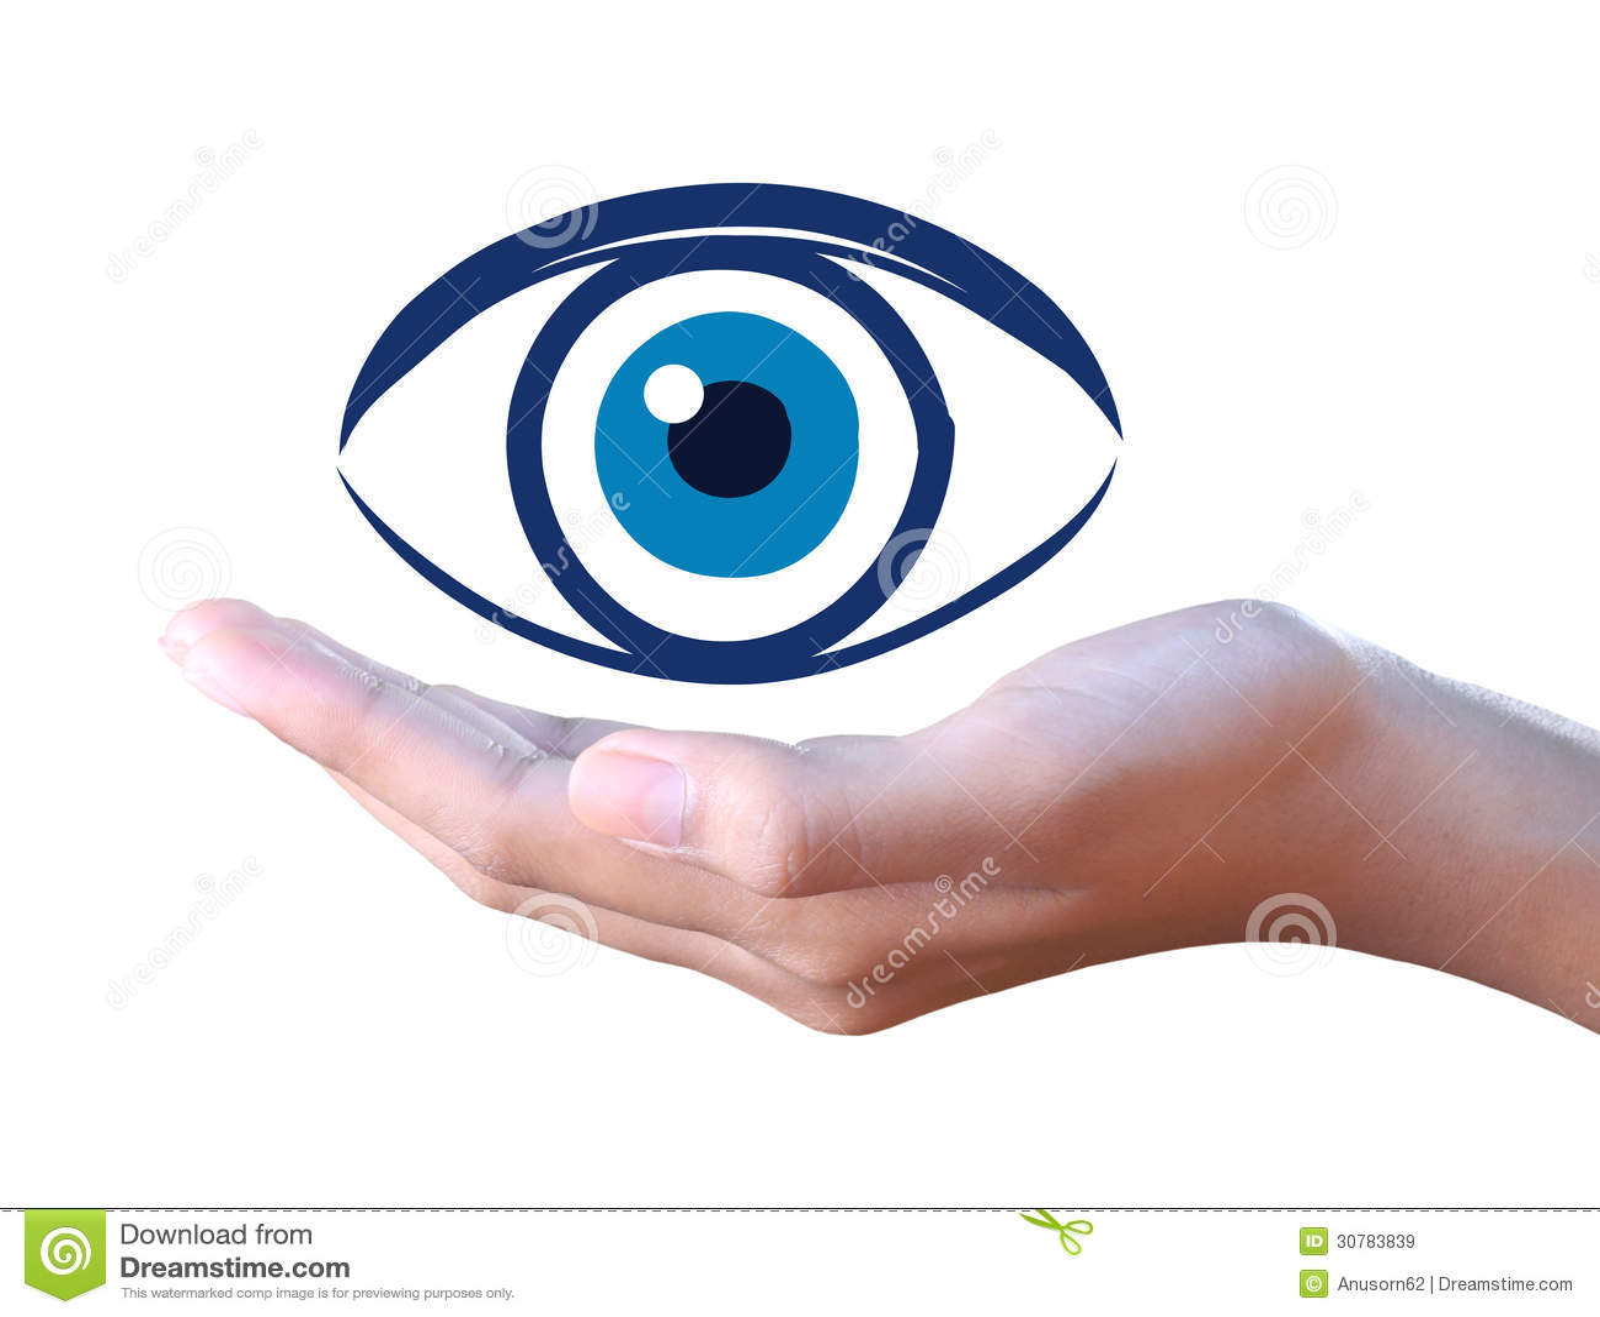 Human Eye In Hand Stock Illustration Illustration Of Hands 30783839